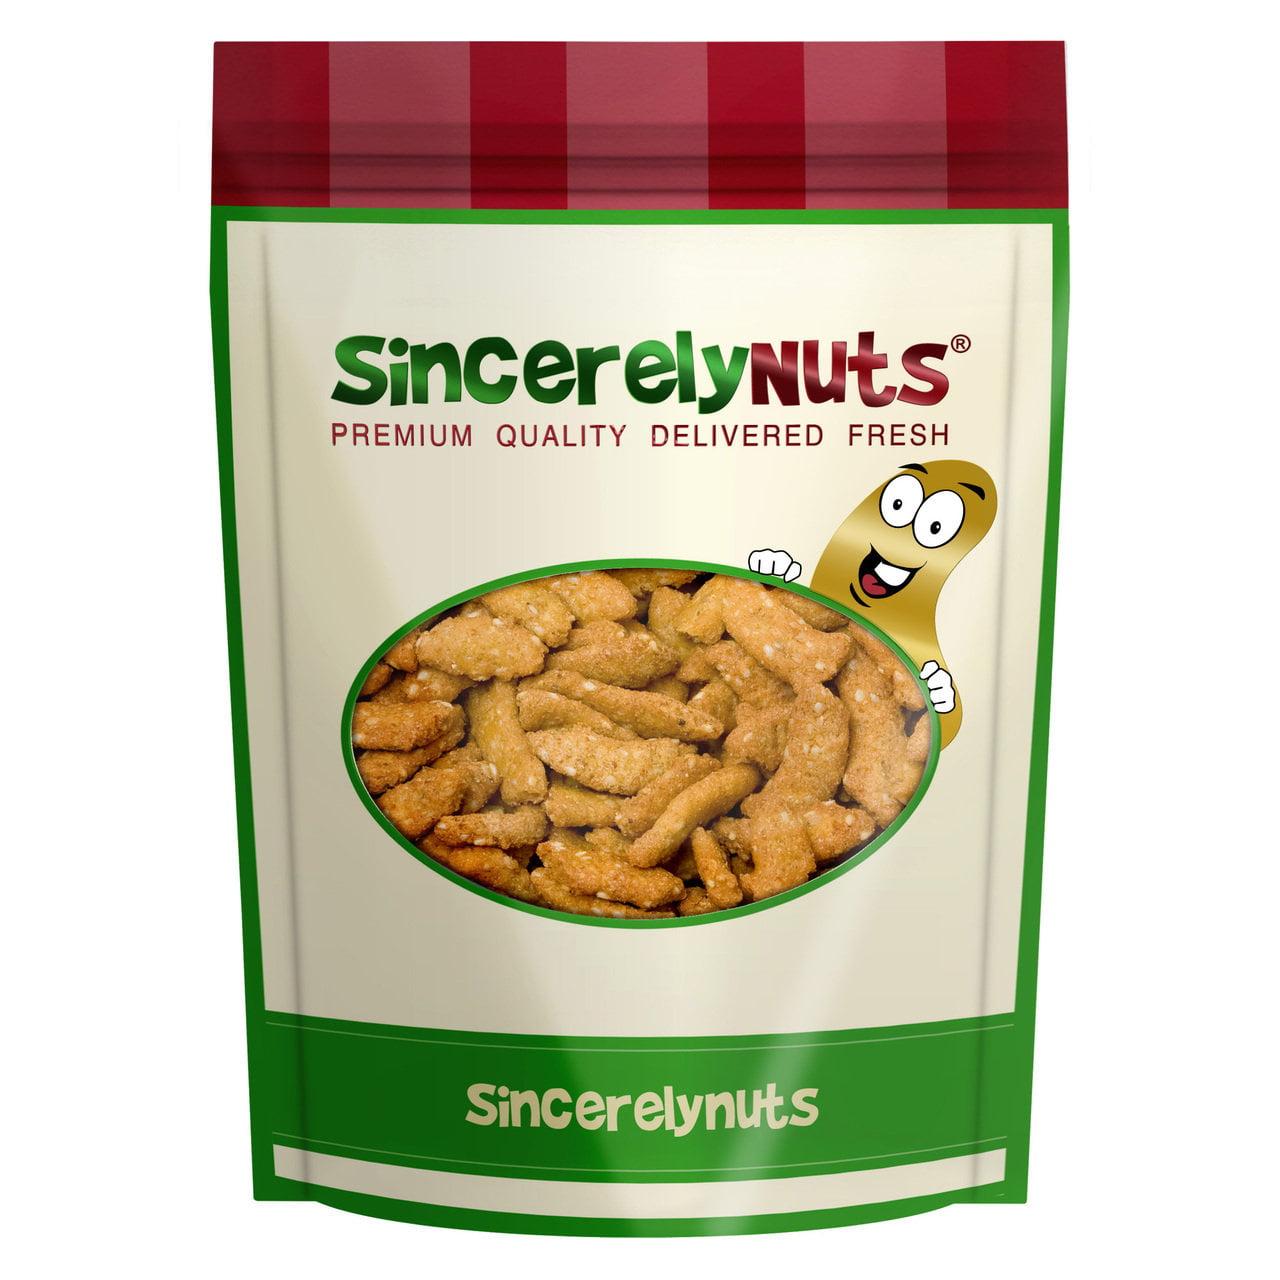 Sincerely Nuts Garlic Sesame Sticks, 3 LB Bag